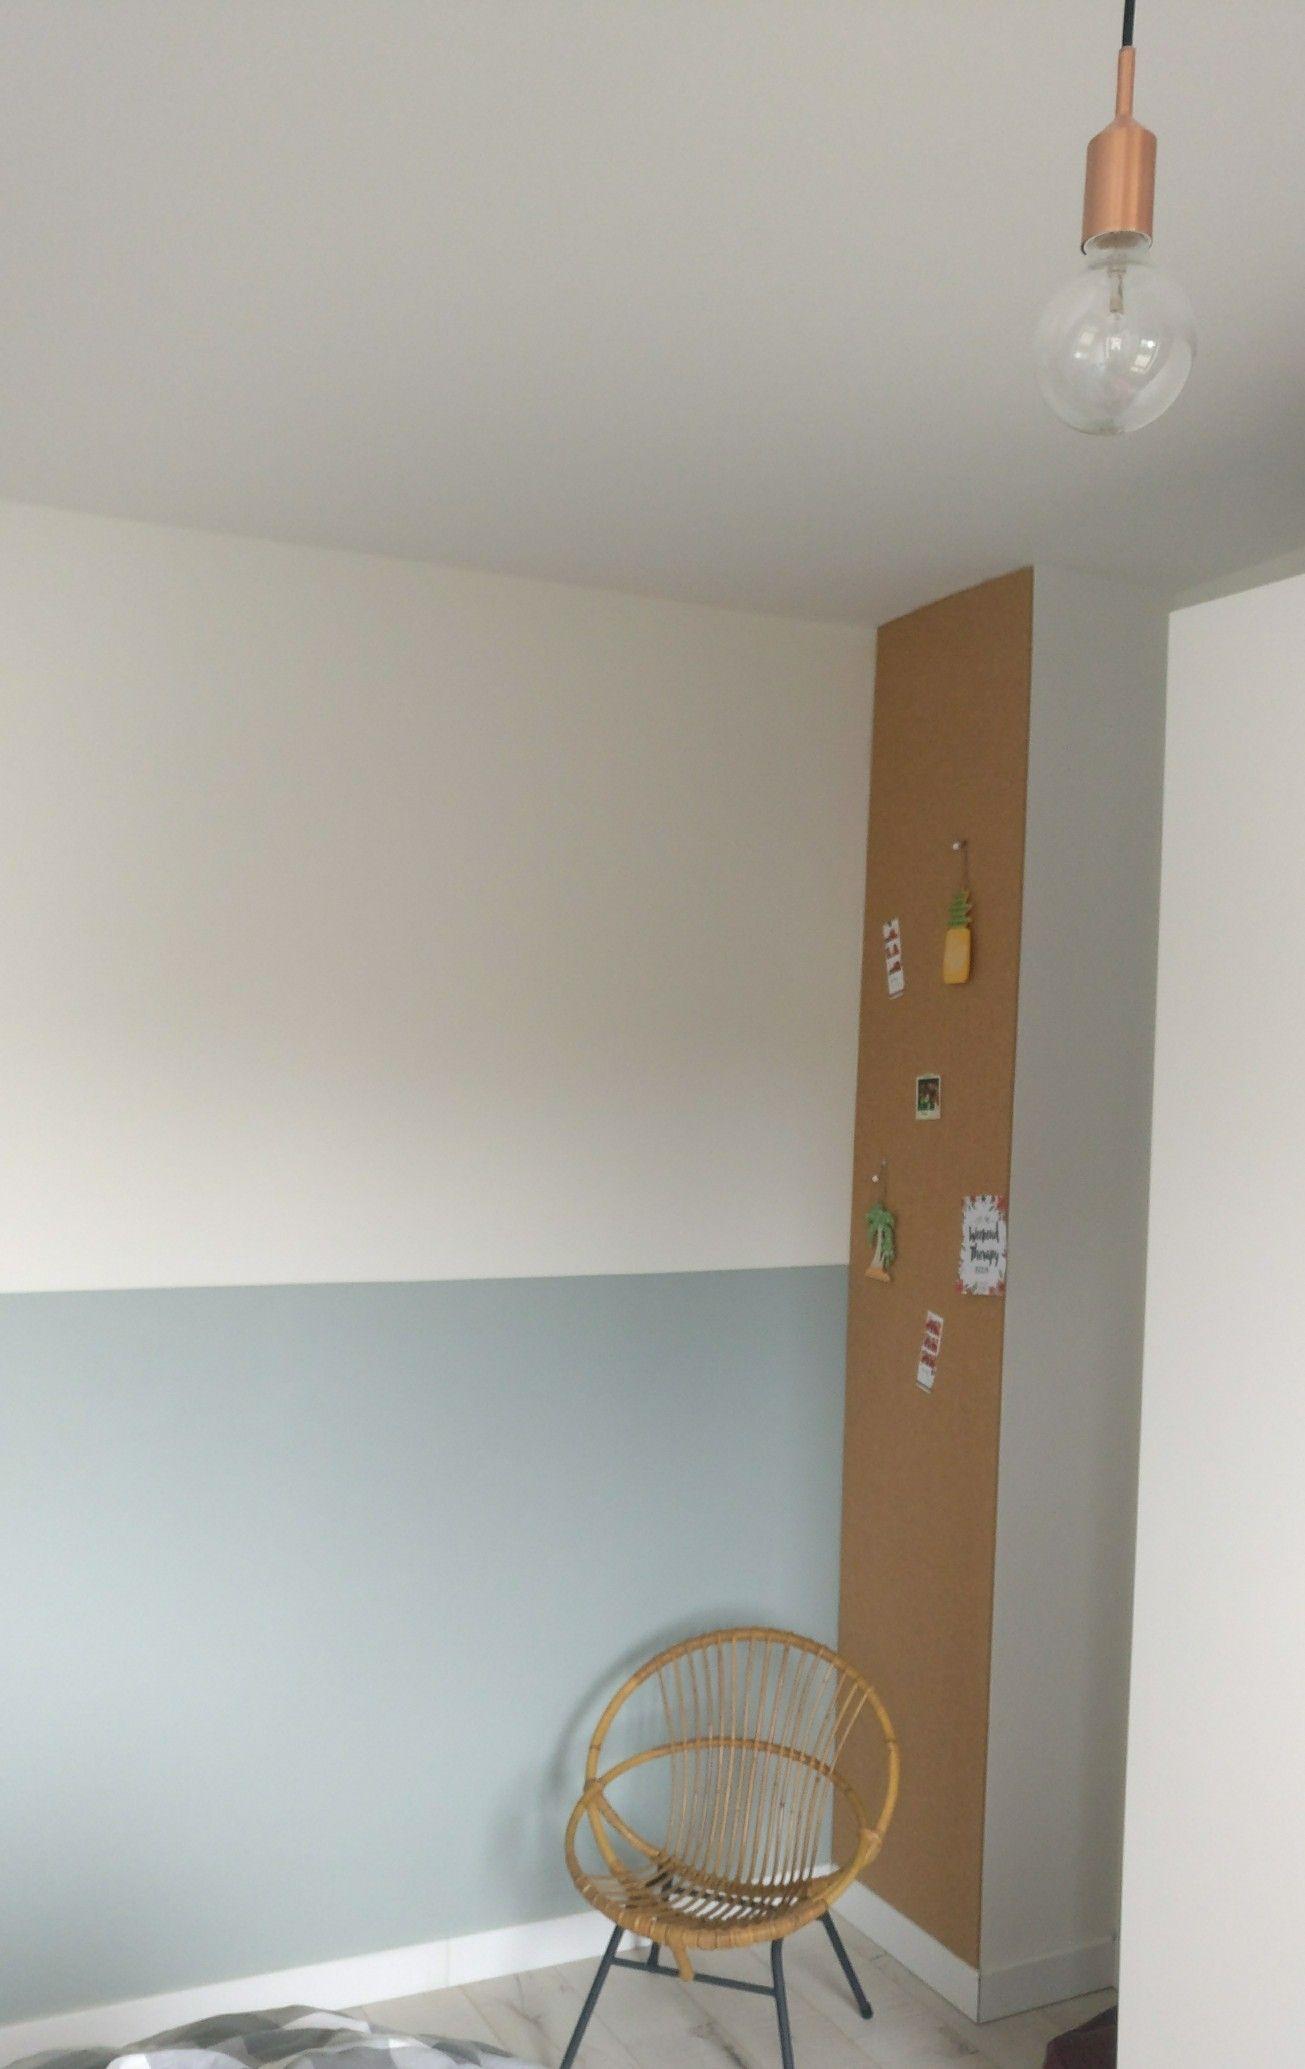 Flexa Early Dew Muurverf.Flexa Early Dew De Wand Links Achter Het Bureau Is De Warme Kleur